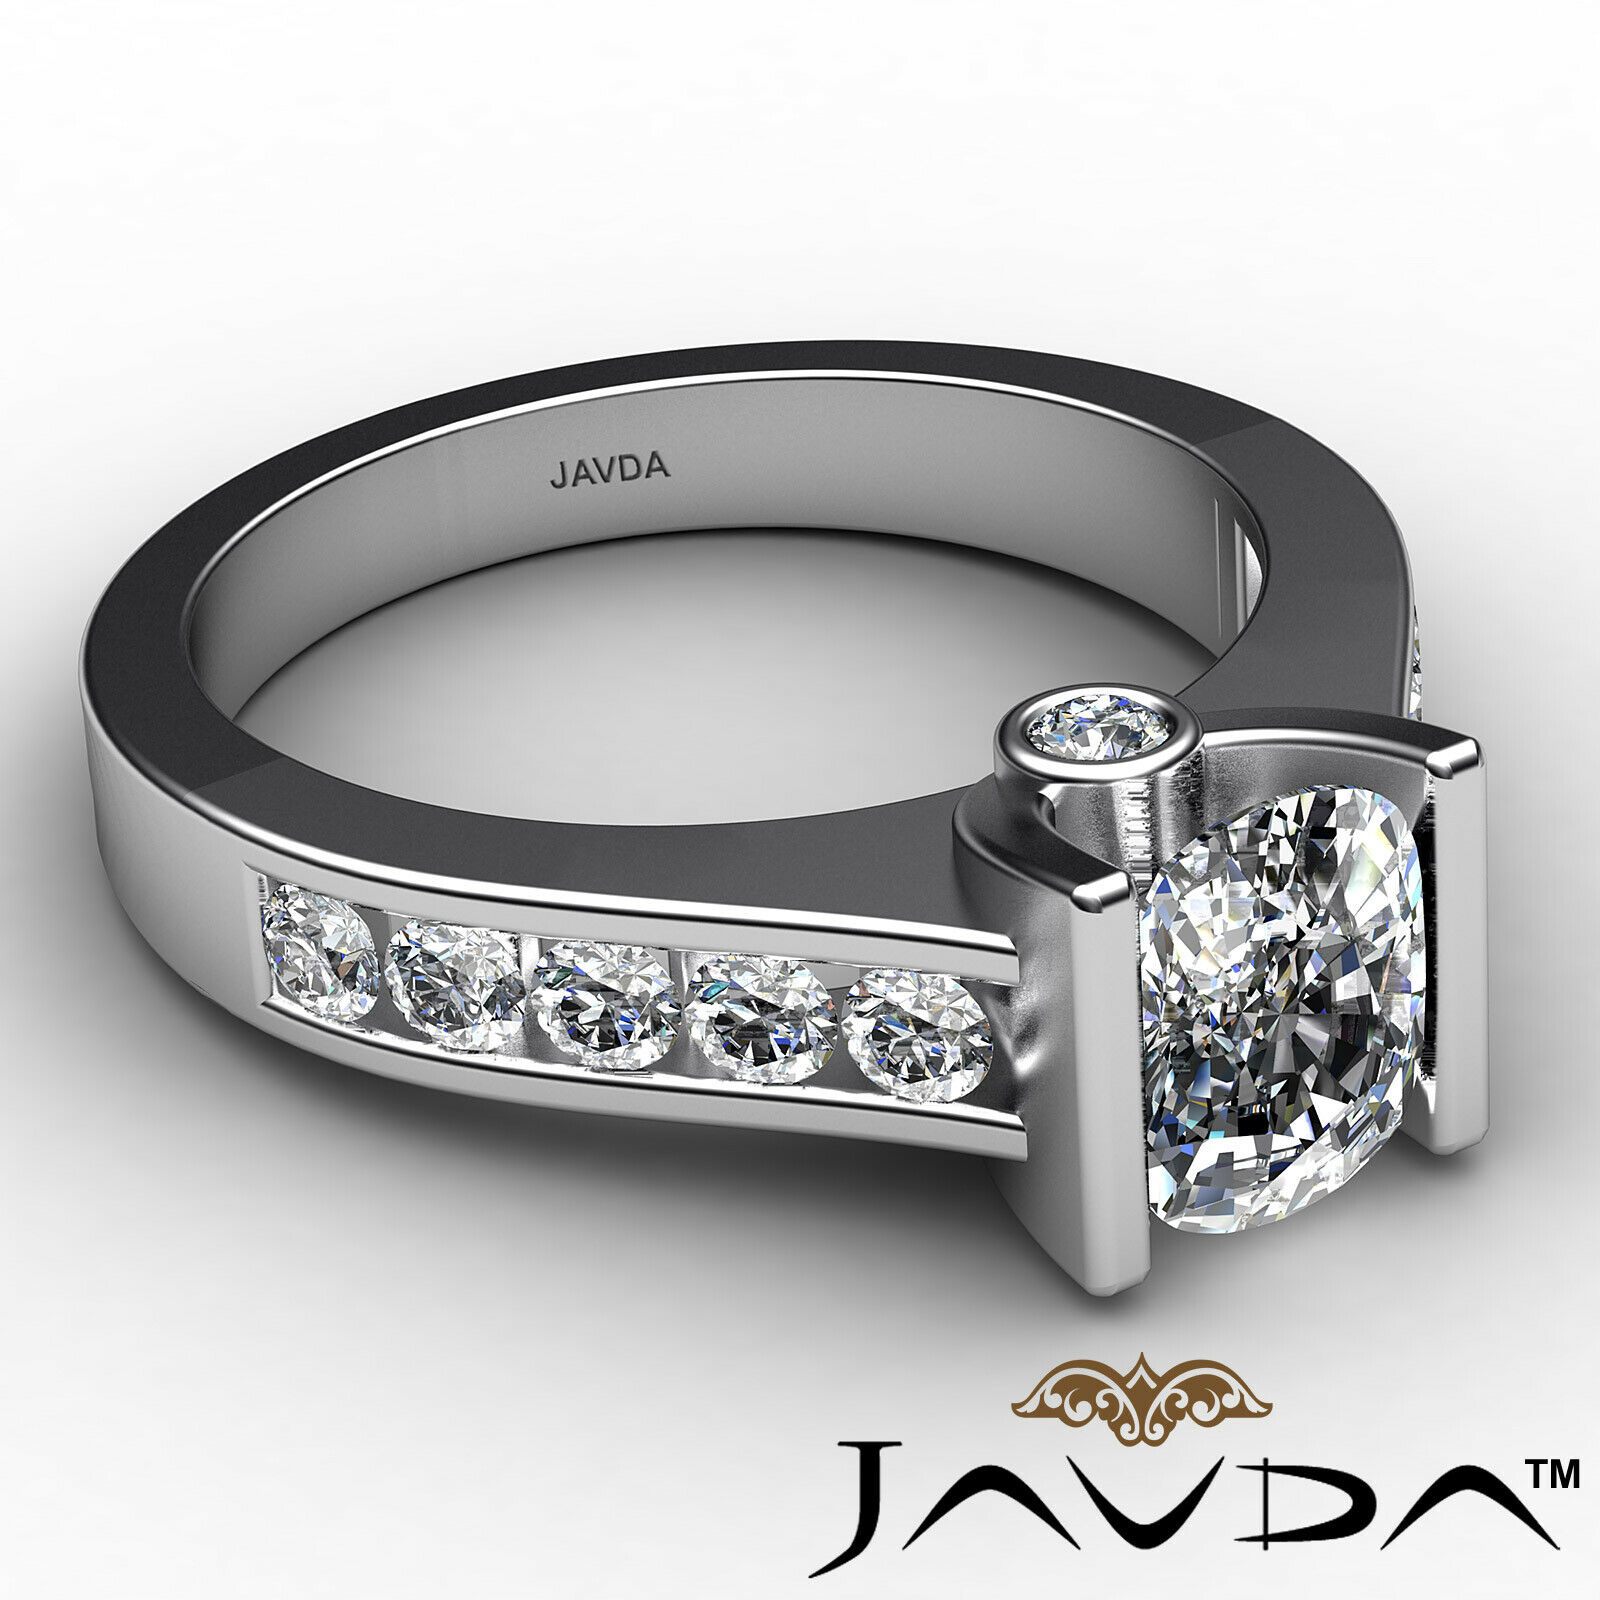 Bezel Cushion Diamond Engagement Women's Ring GIA, J Color SI1 clarity 1.53 ctw. 6